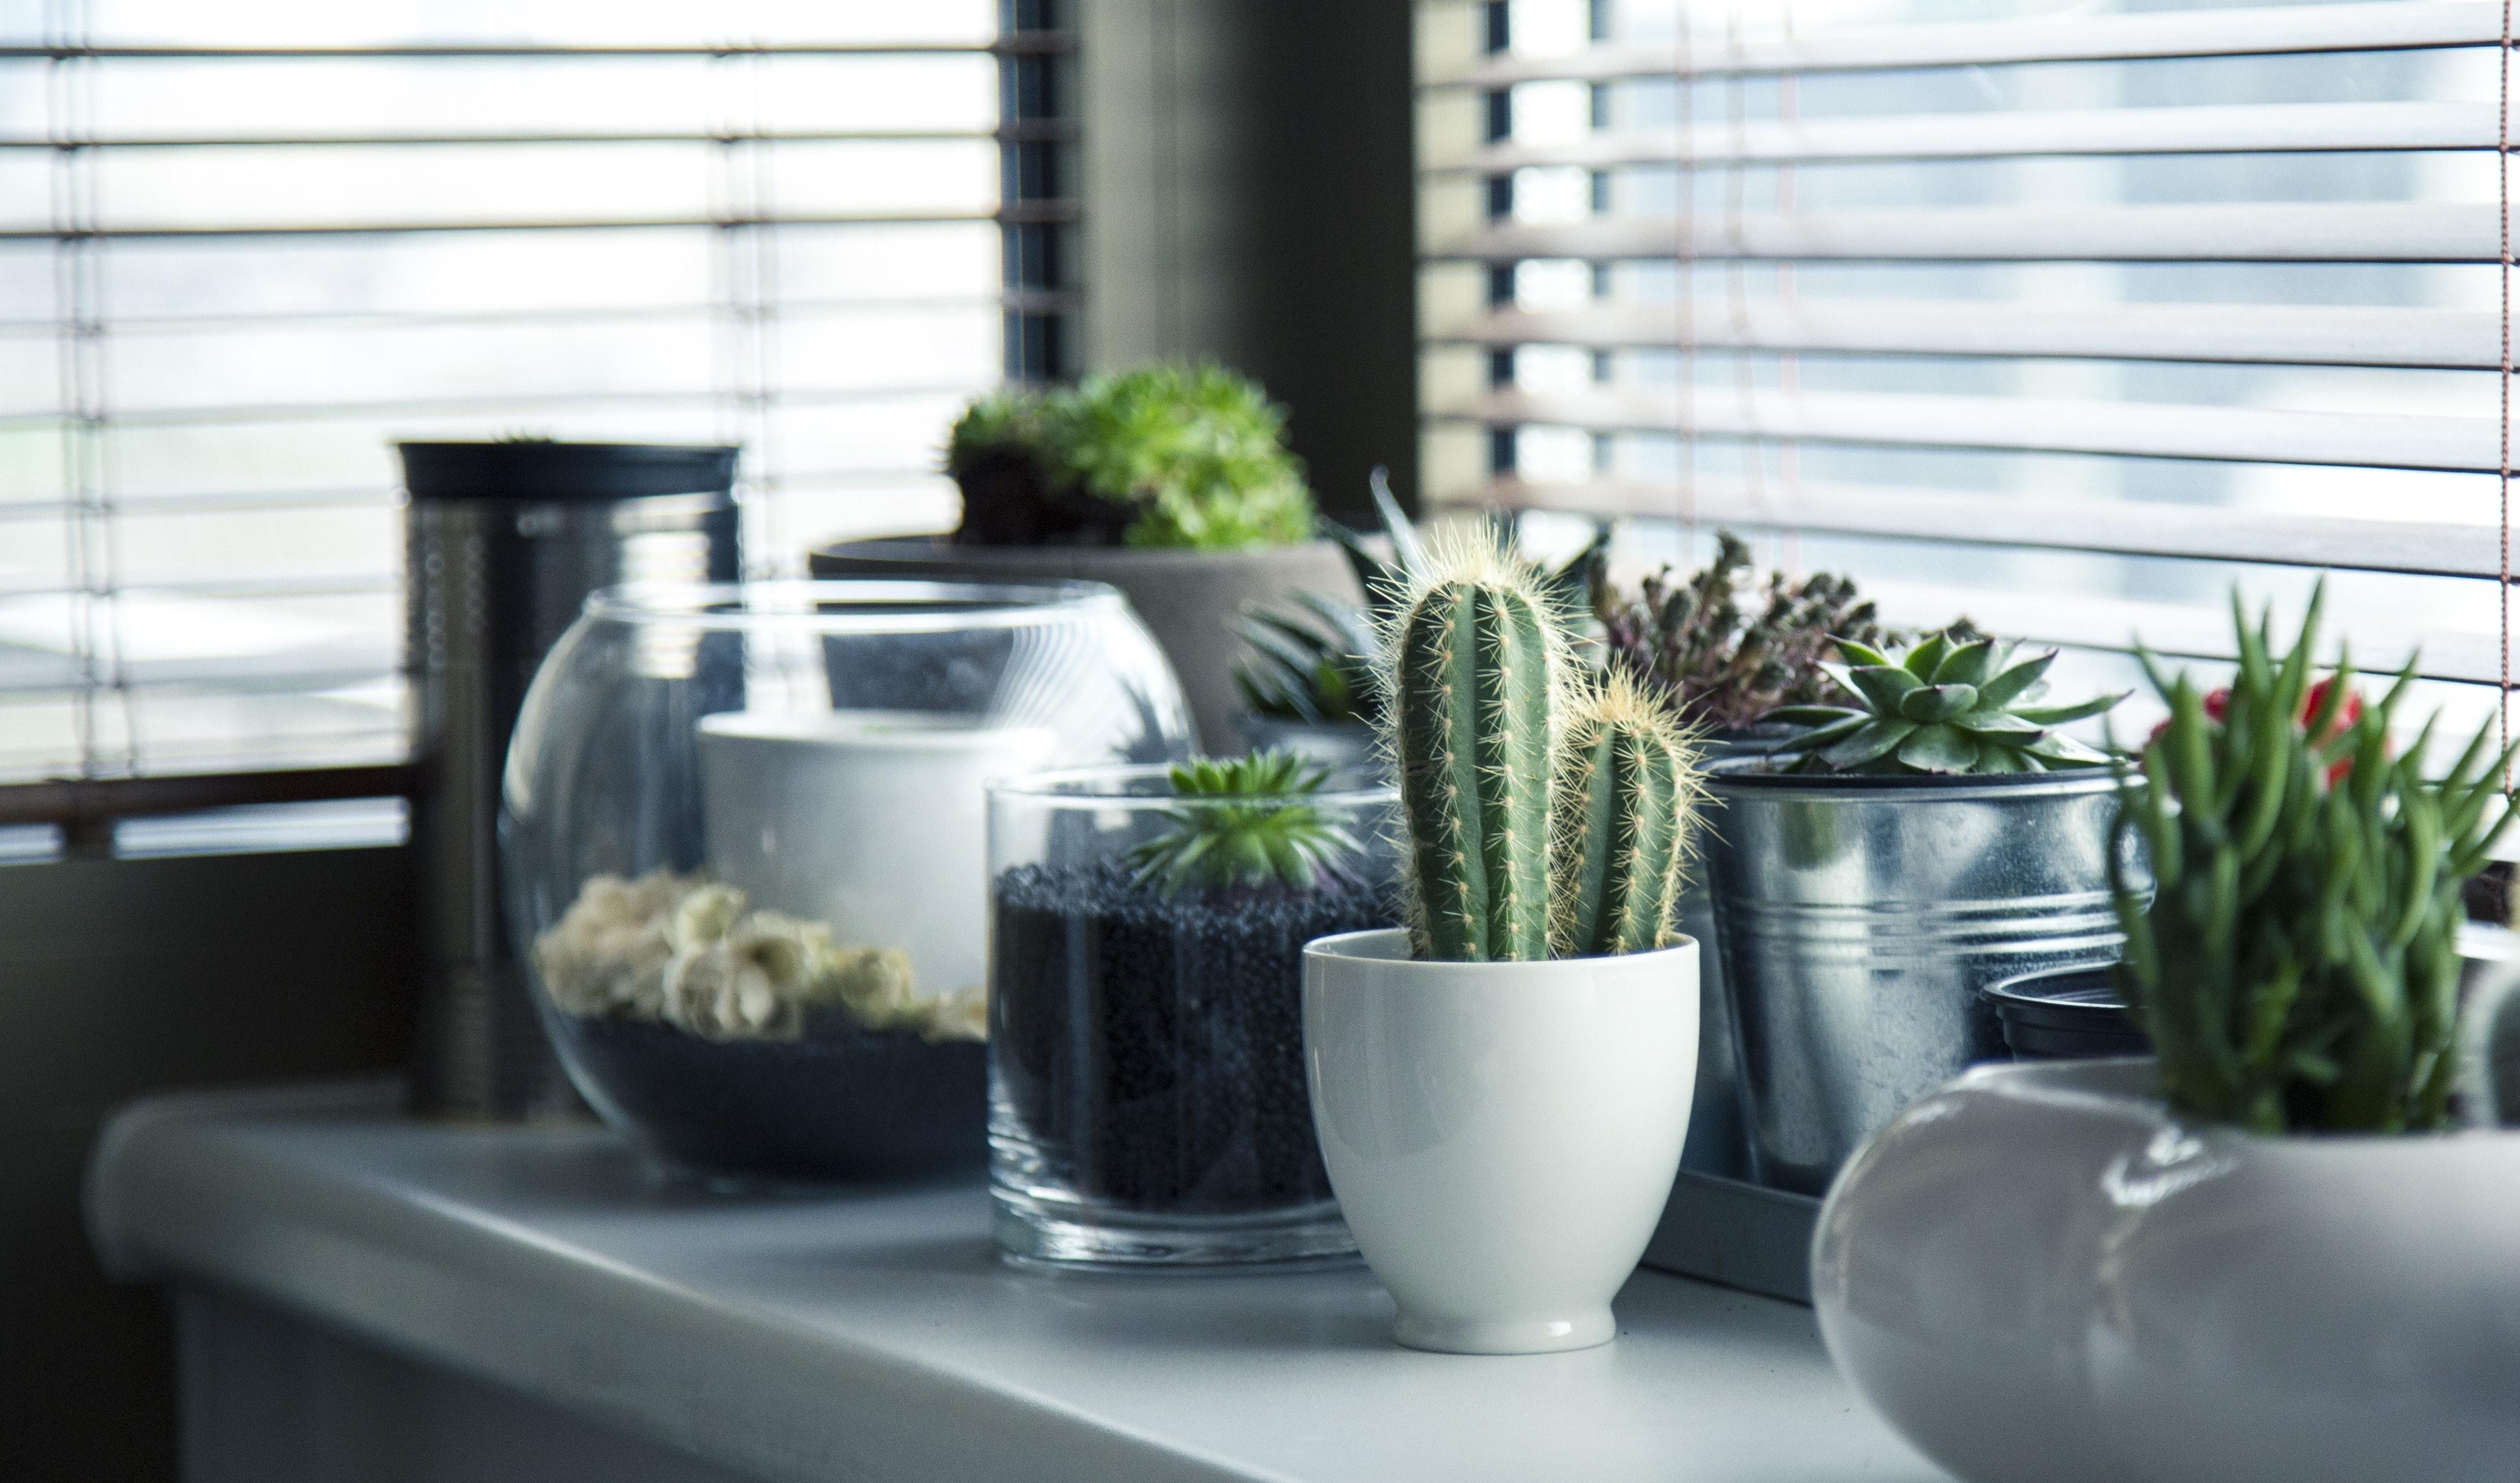 Badkamer-Planten-Excellentwonenleven